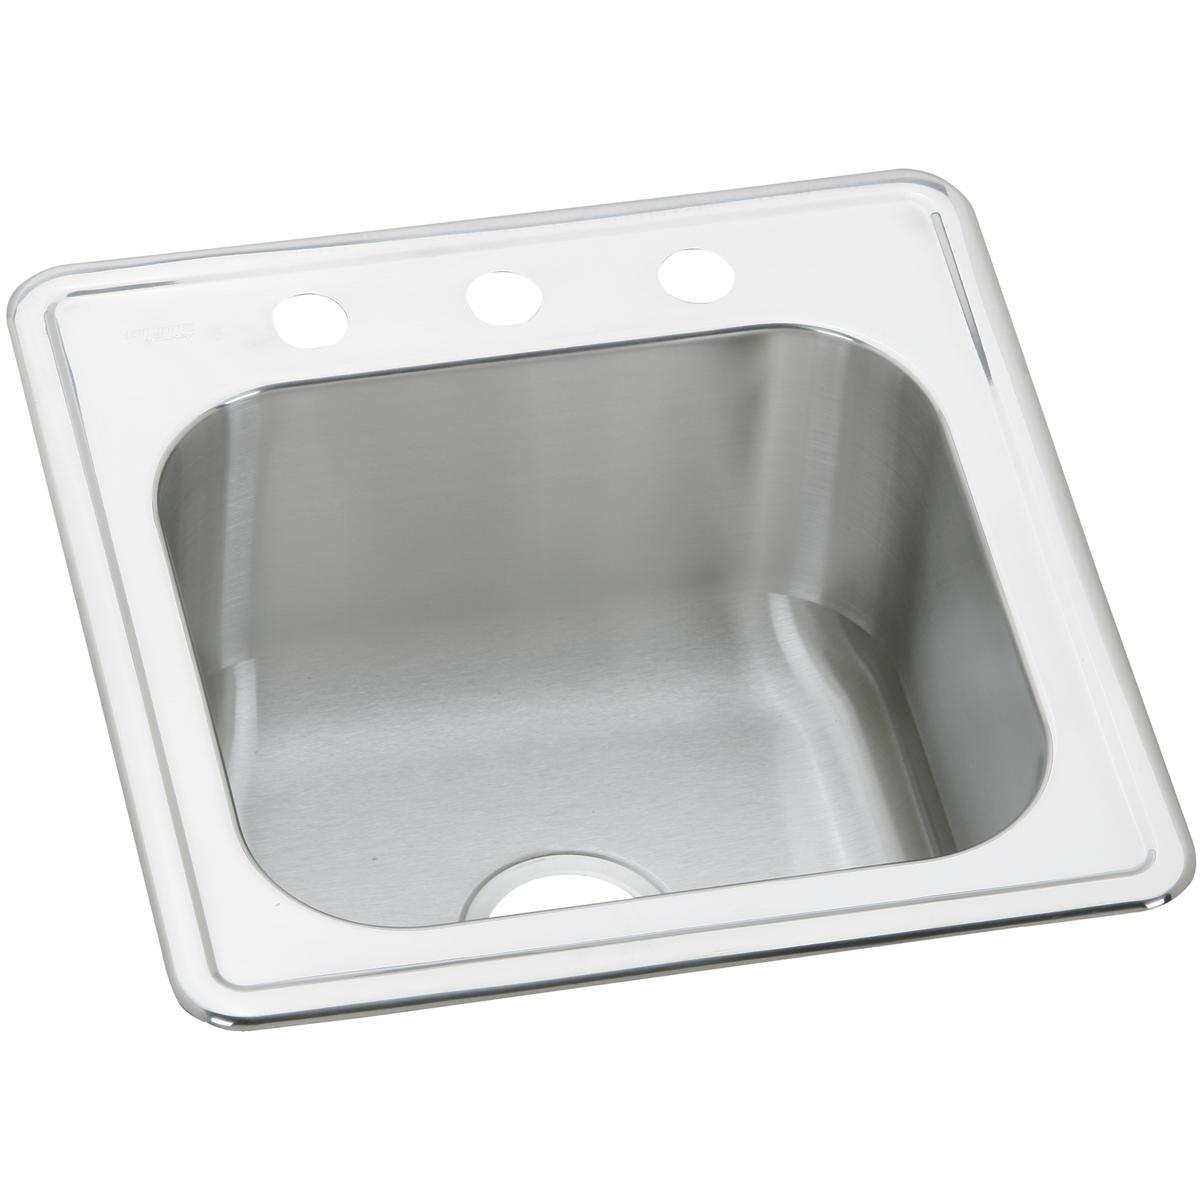 Elkay ESE2020101 Celebrity Single Bowl Drop-in Stainless Steel Laundry Sink